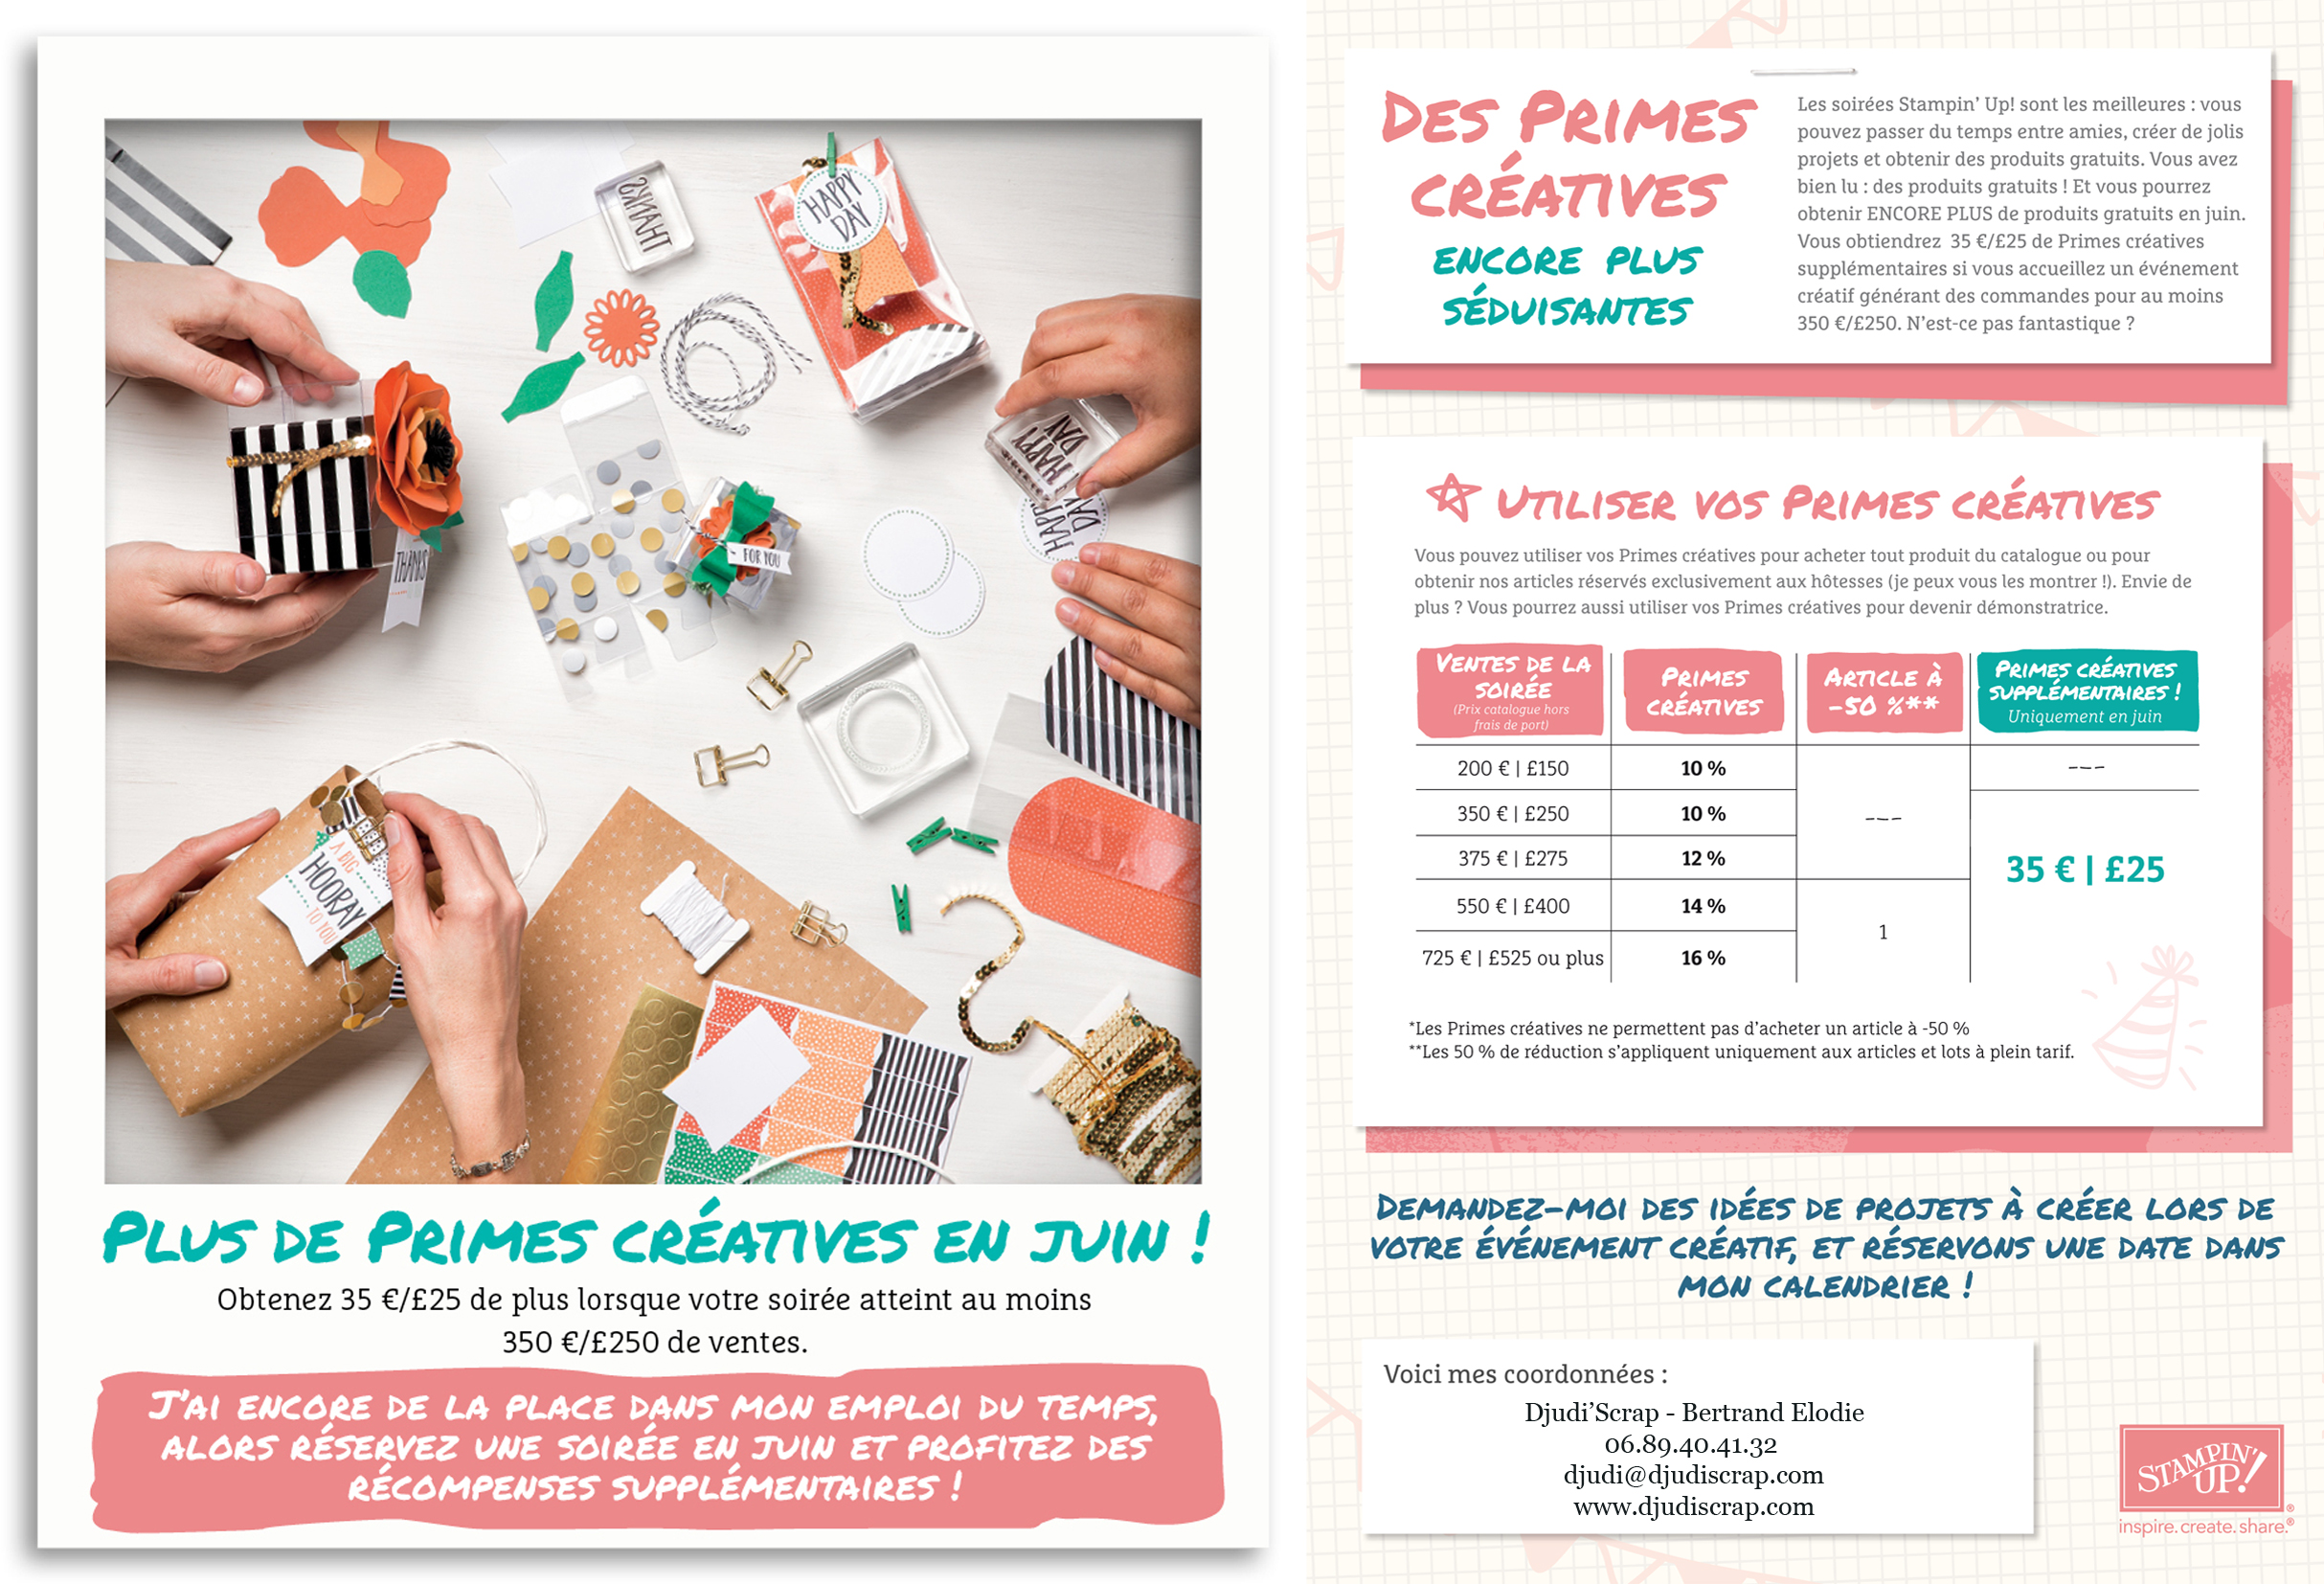 Stampin'Up! - Promotion Primes Créatives Juin